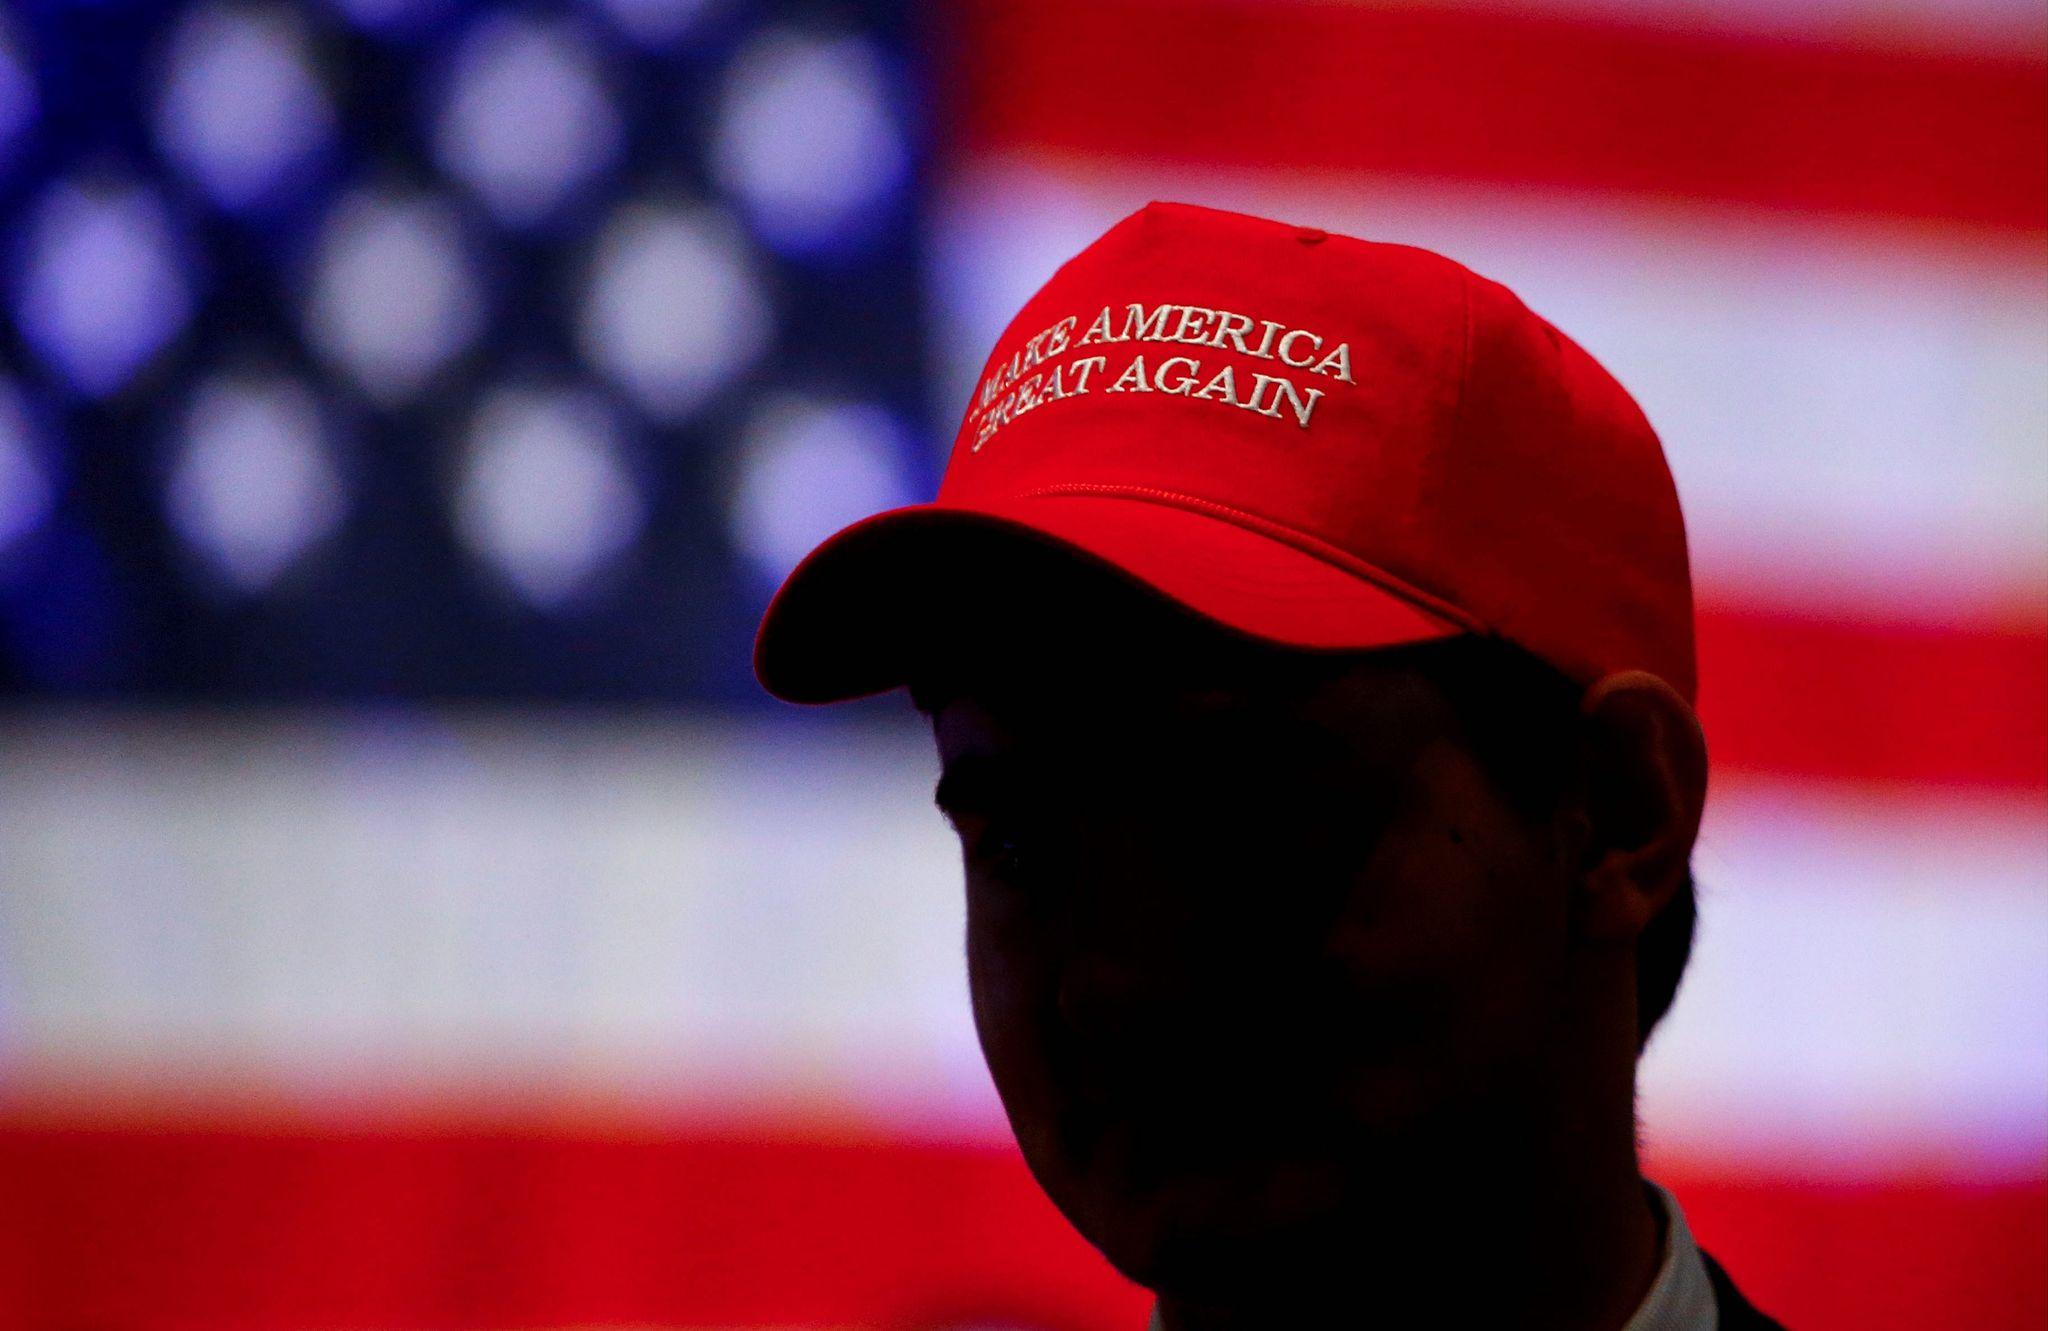 684ab389b64 Donald Trump MAGA hat powerful political symbol - Washington Times